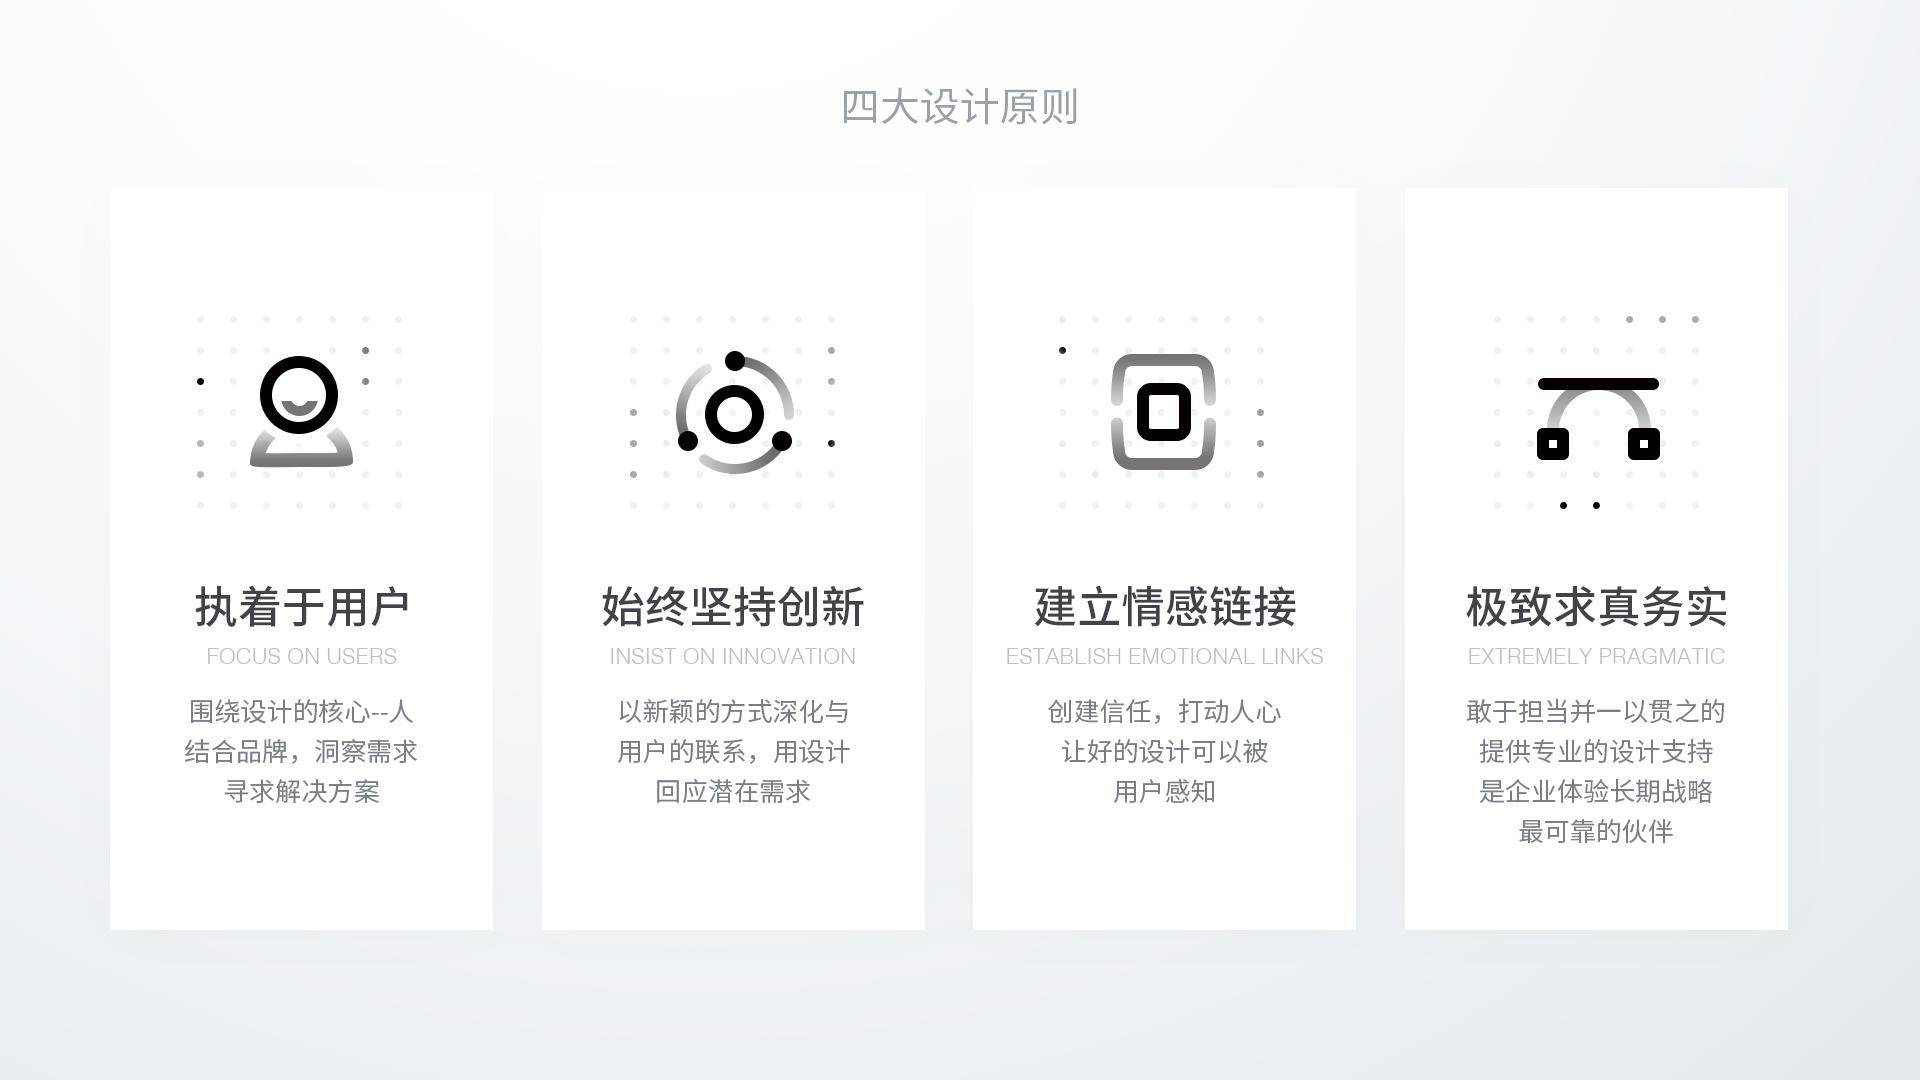 四大设计原则.png